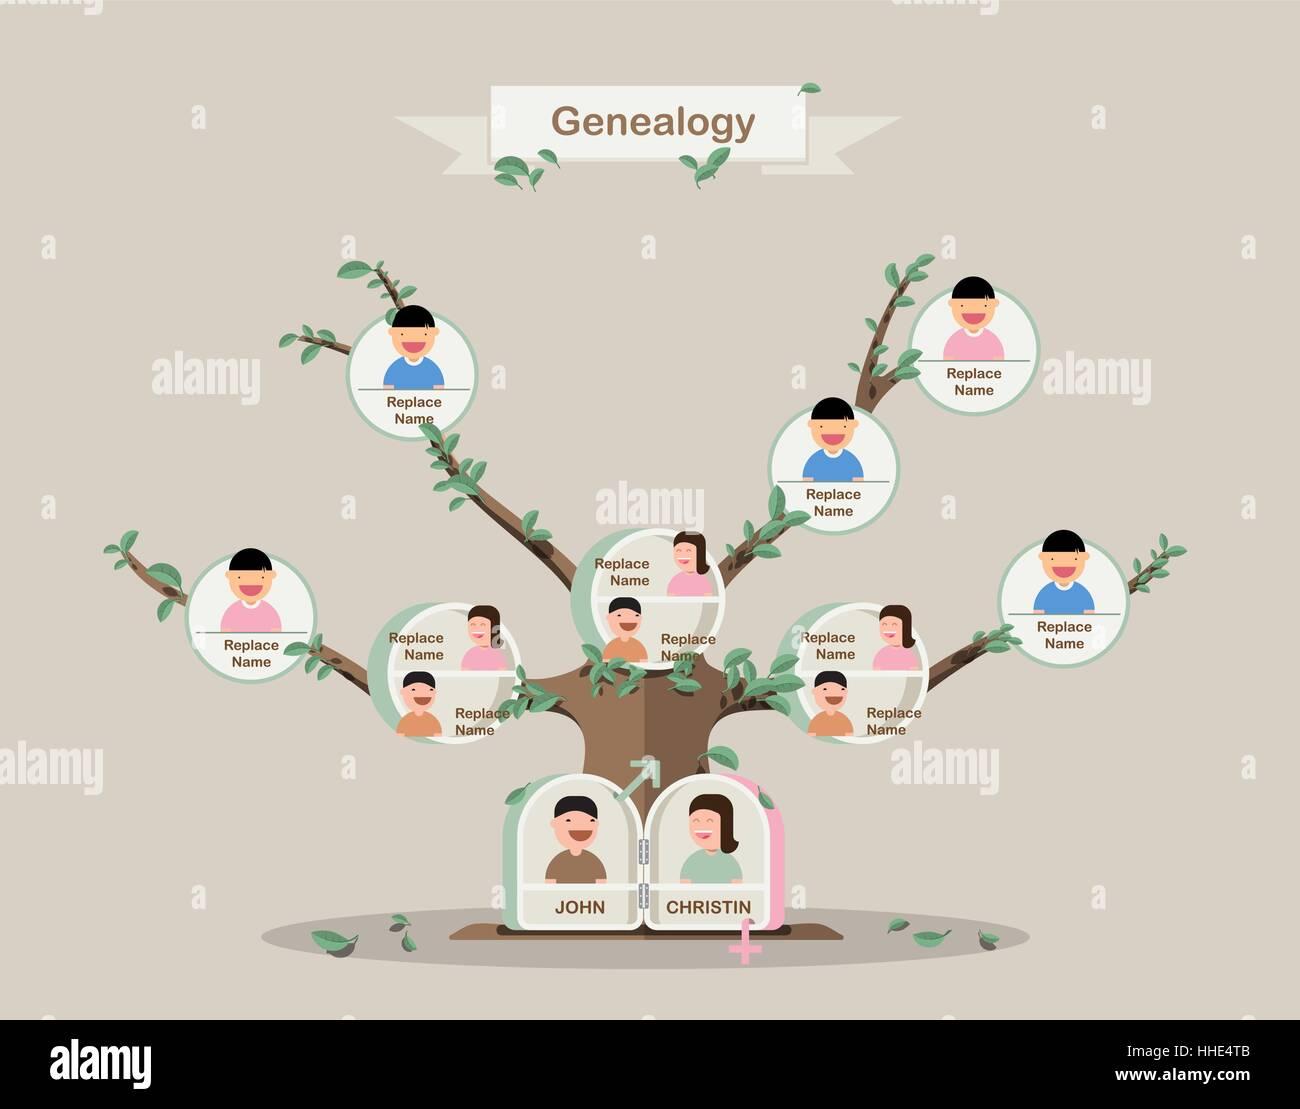 genealogical tree family tree in flatdesign pedigree template